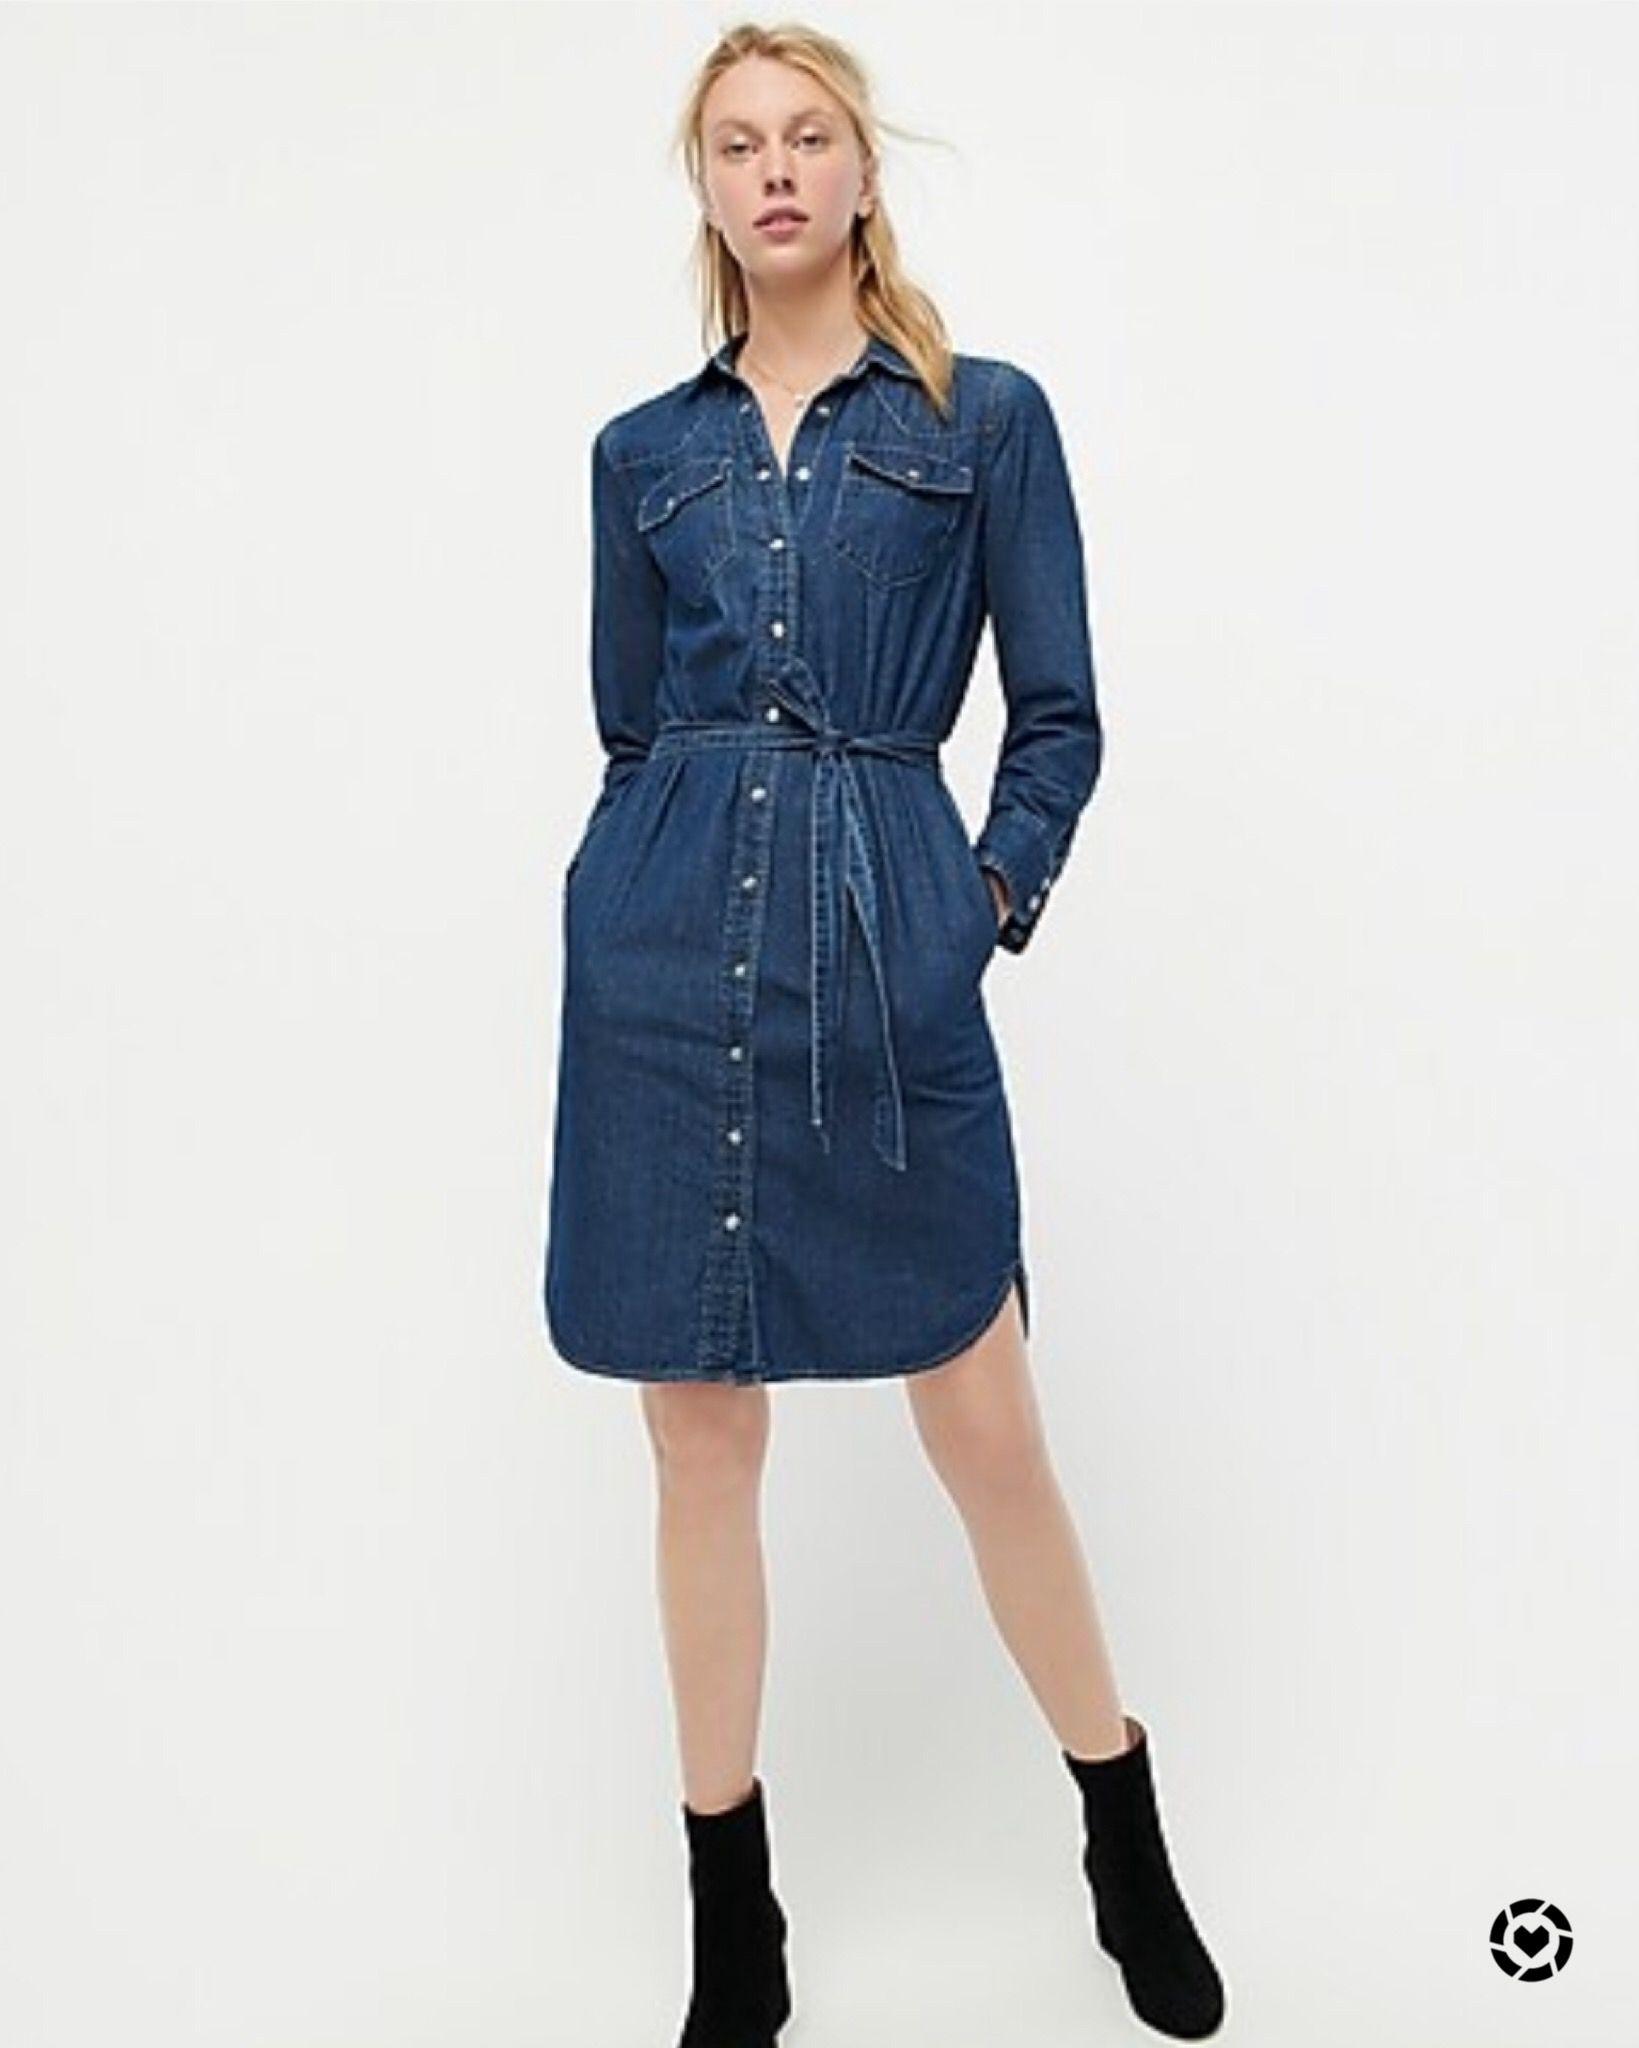 jcrewsale | Fashion, Denim shirt dress, Shirt dress